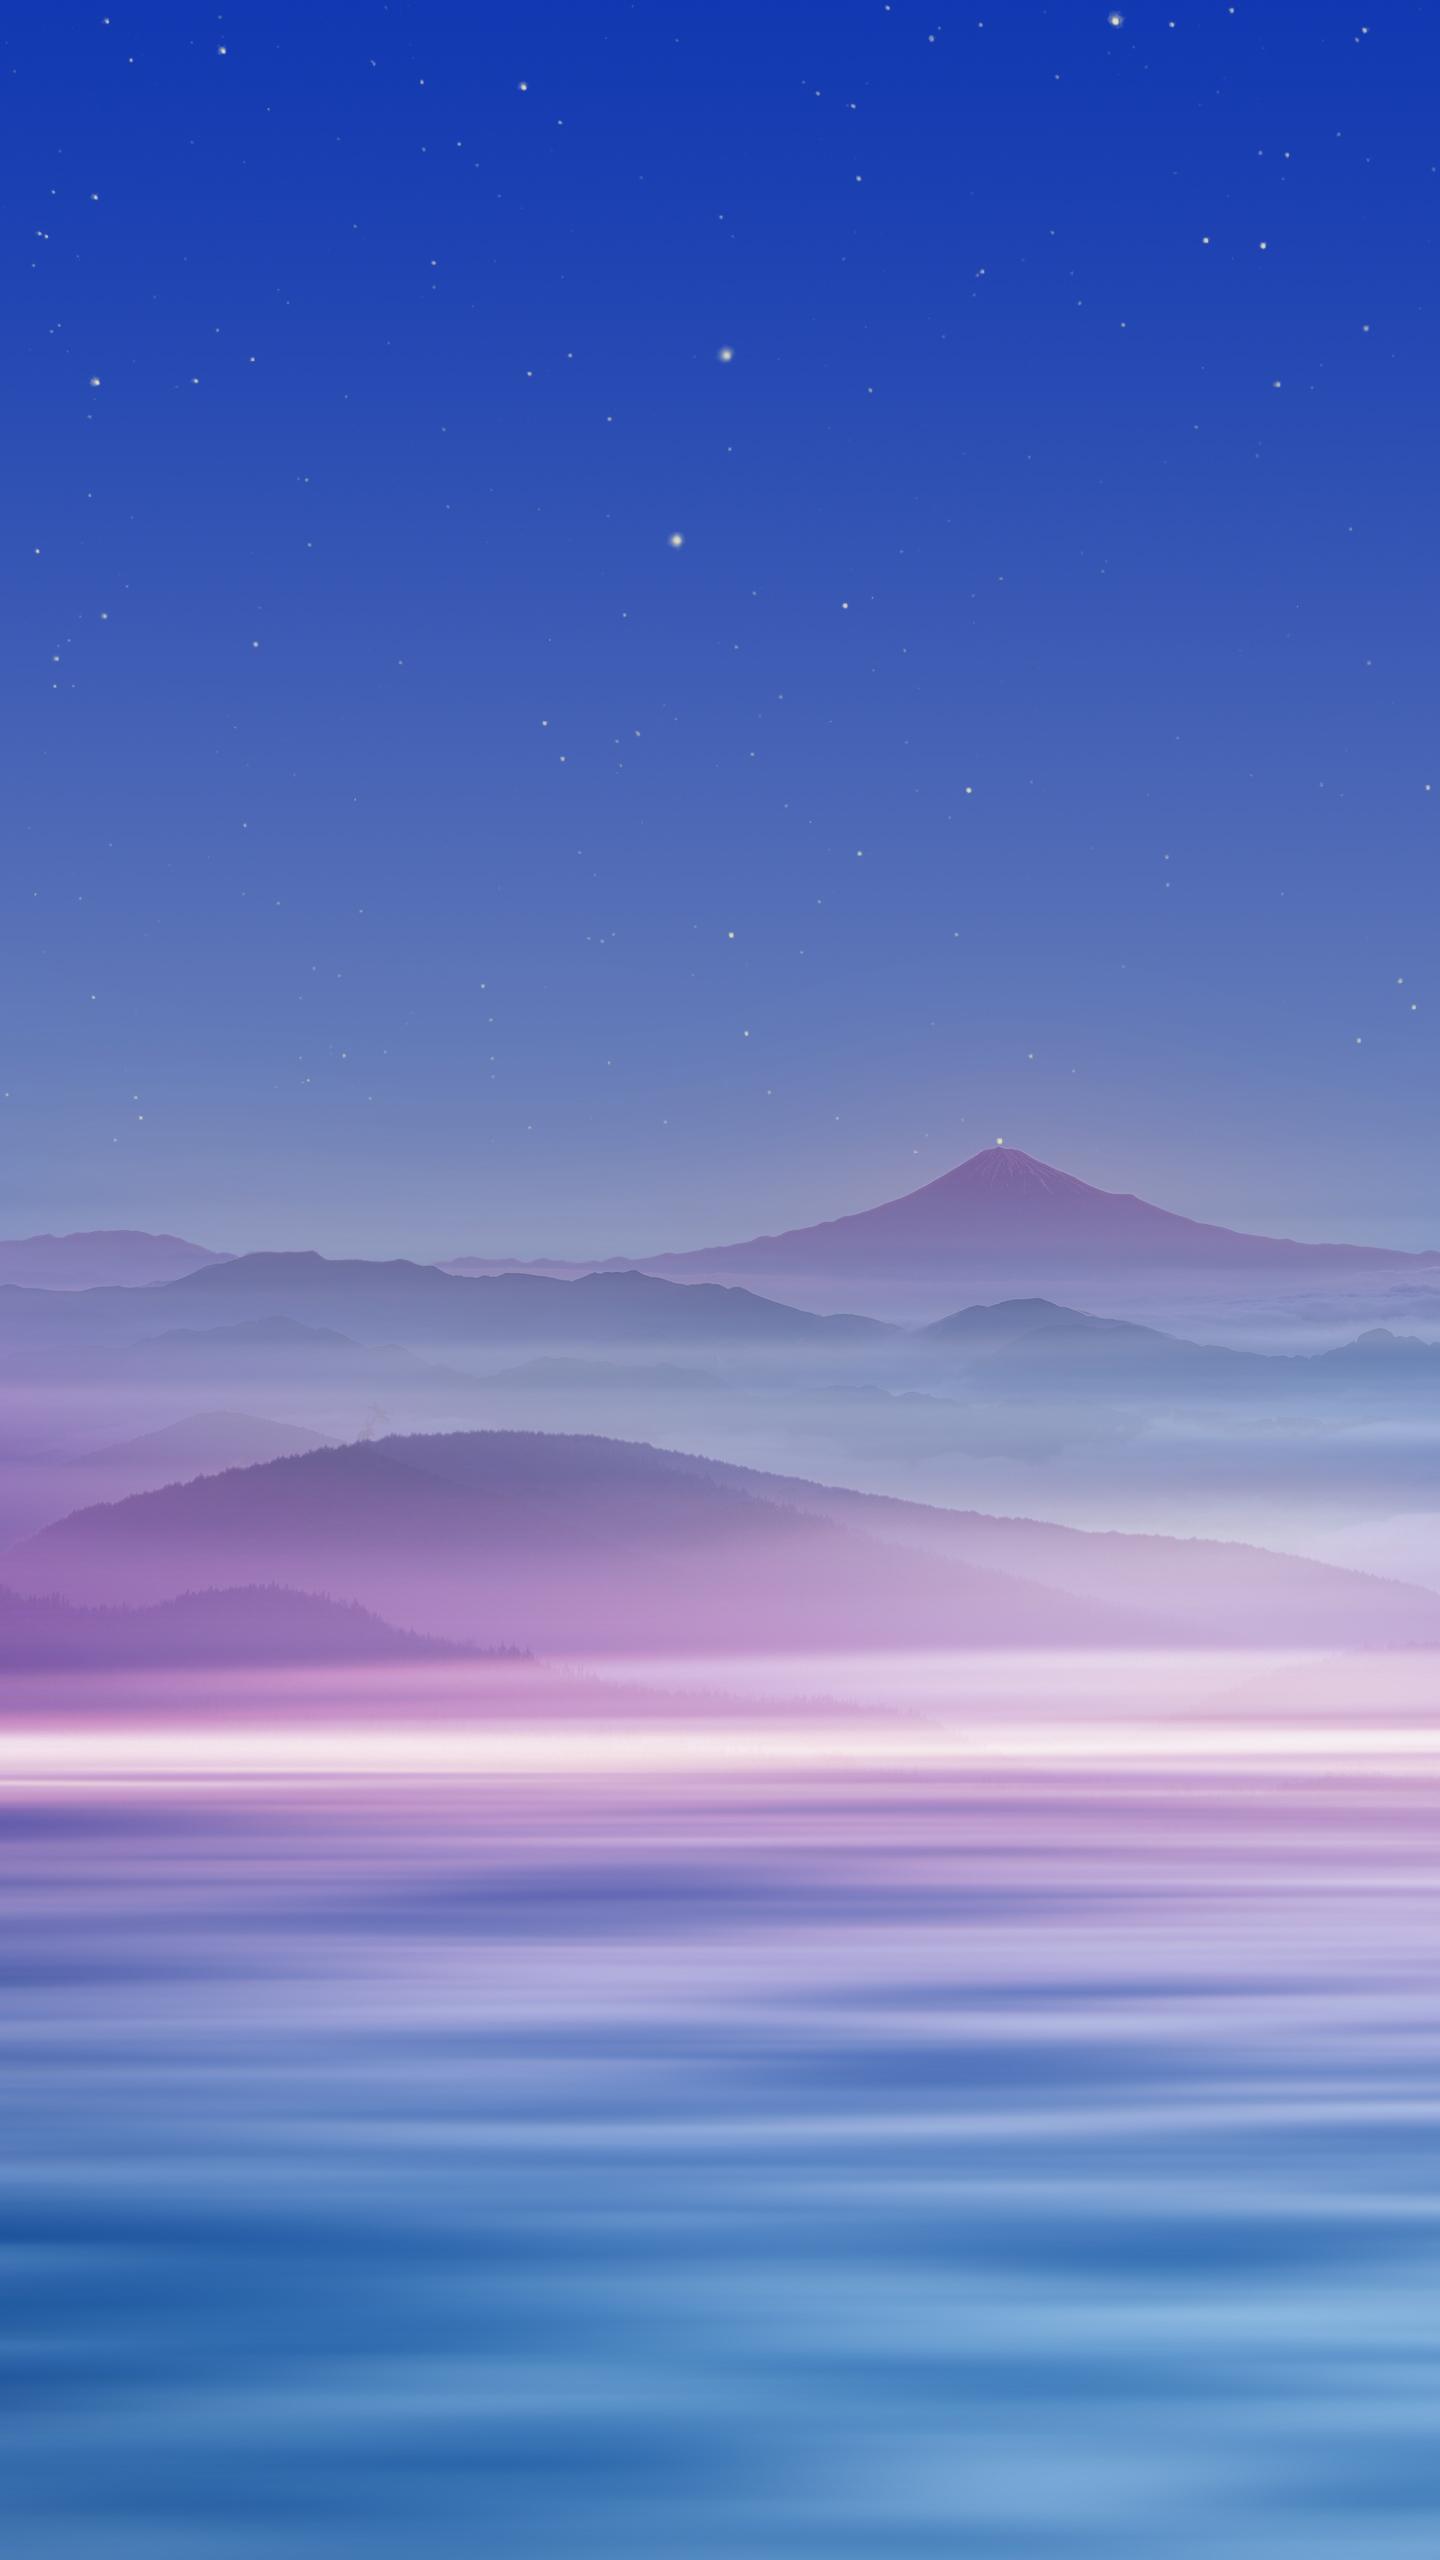 Amato Mountain Wallpaper Galaxy S7 Edge by mobi900 on DeviantArt QH26